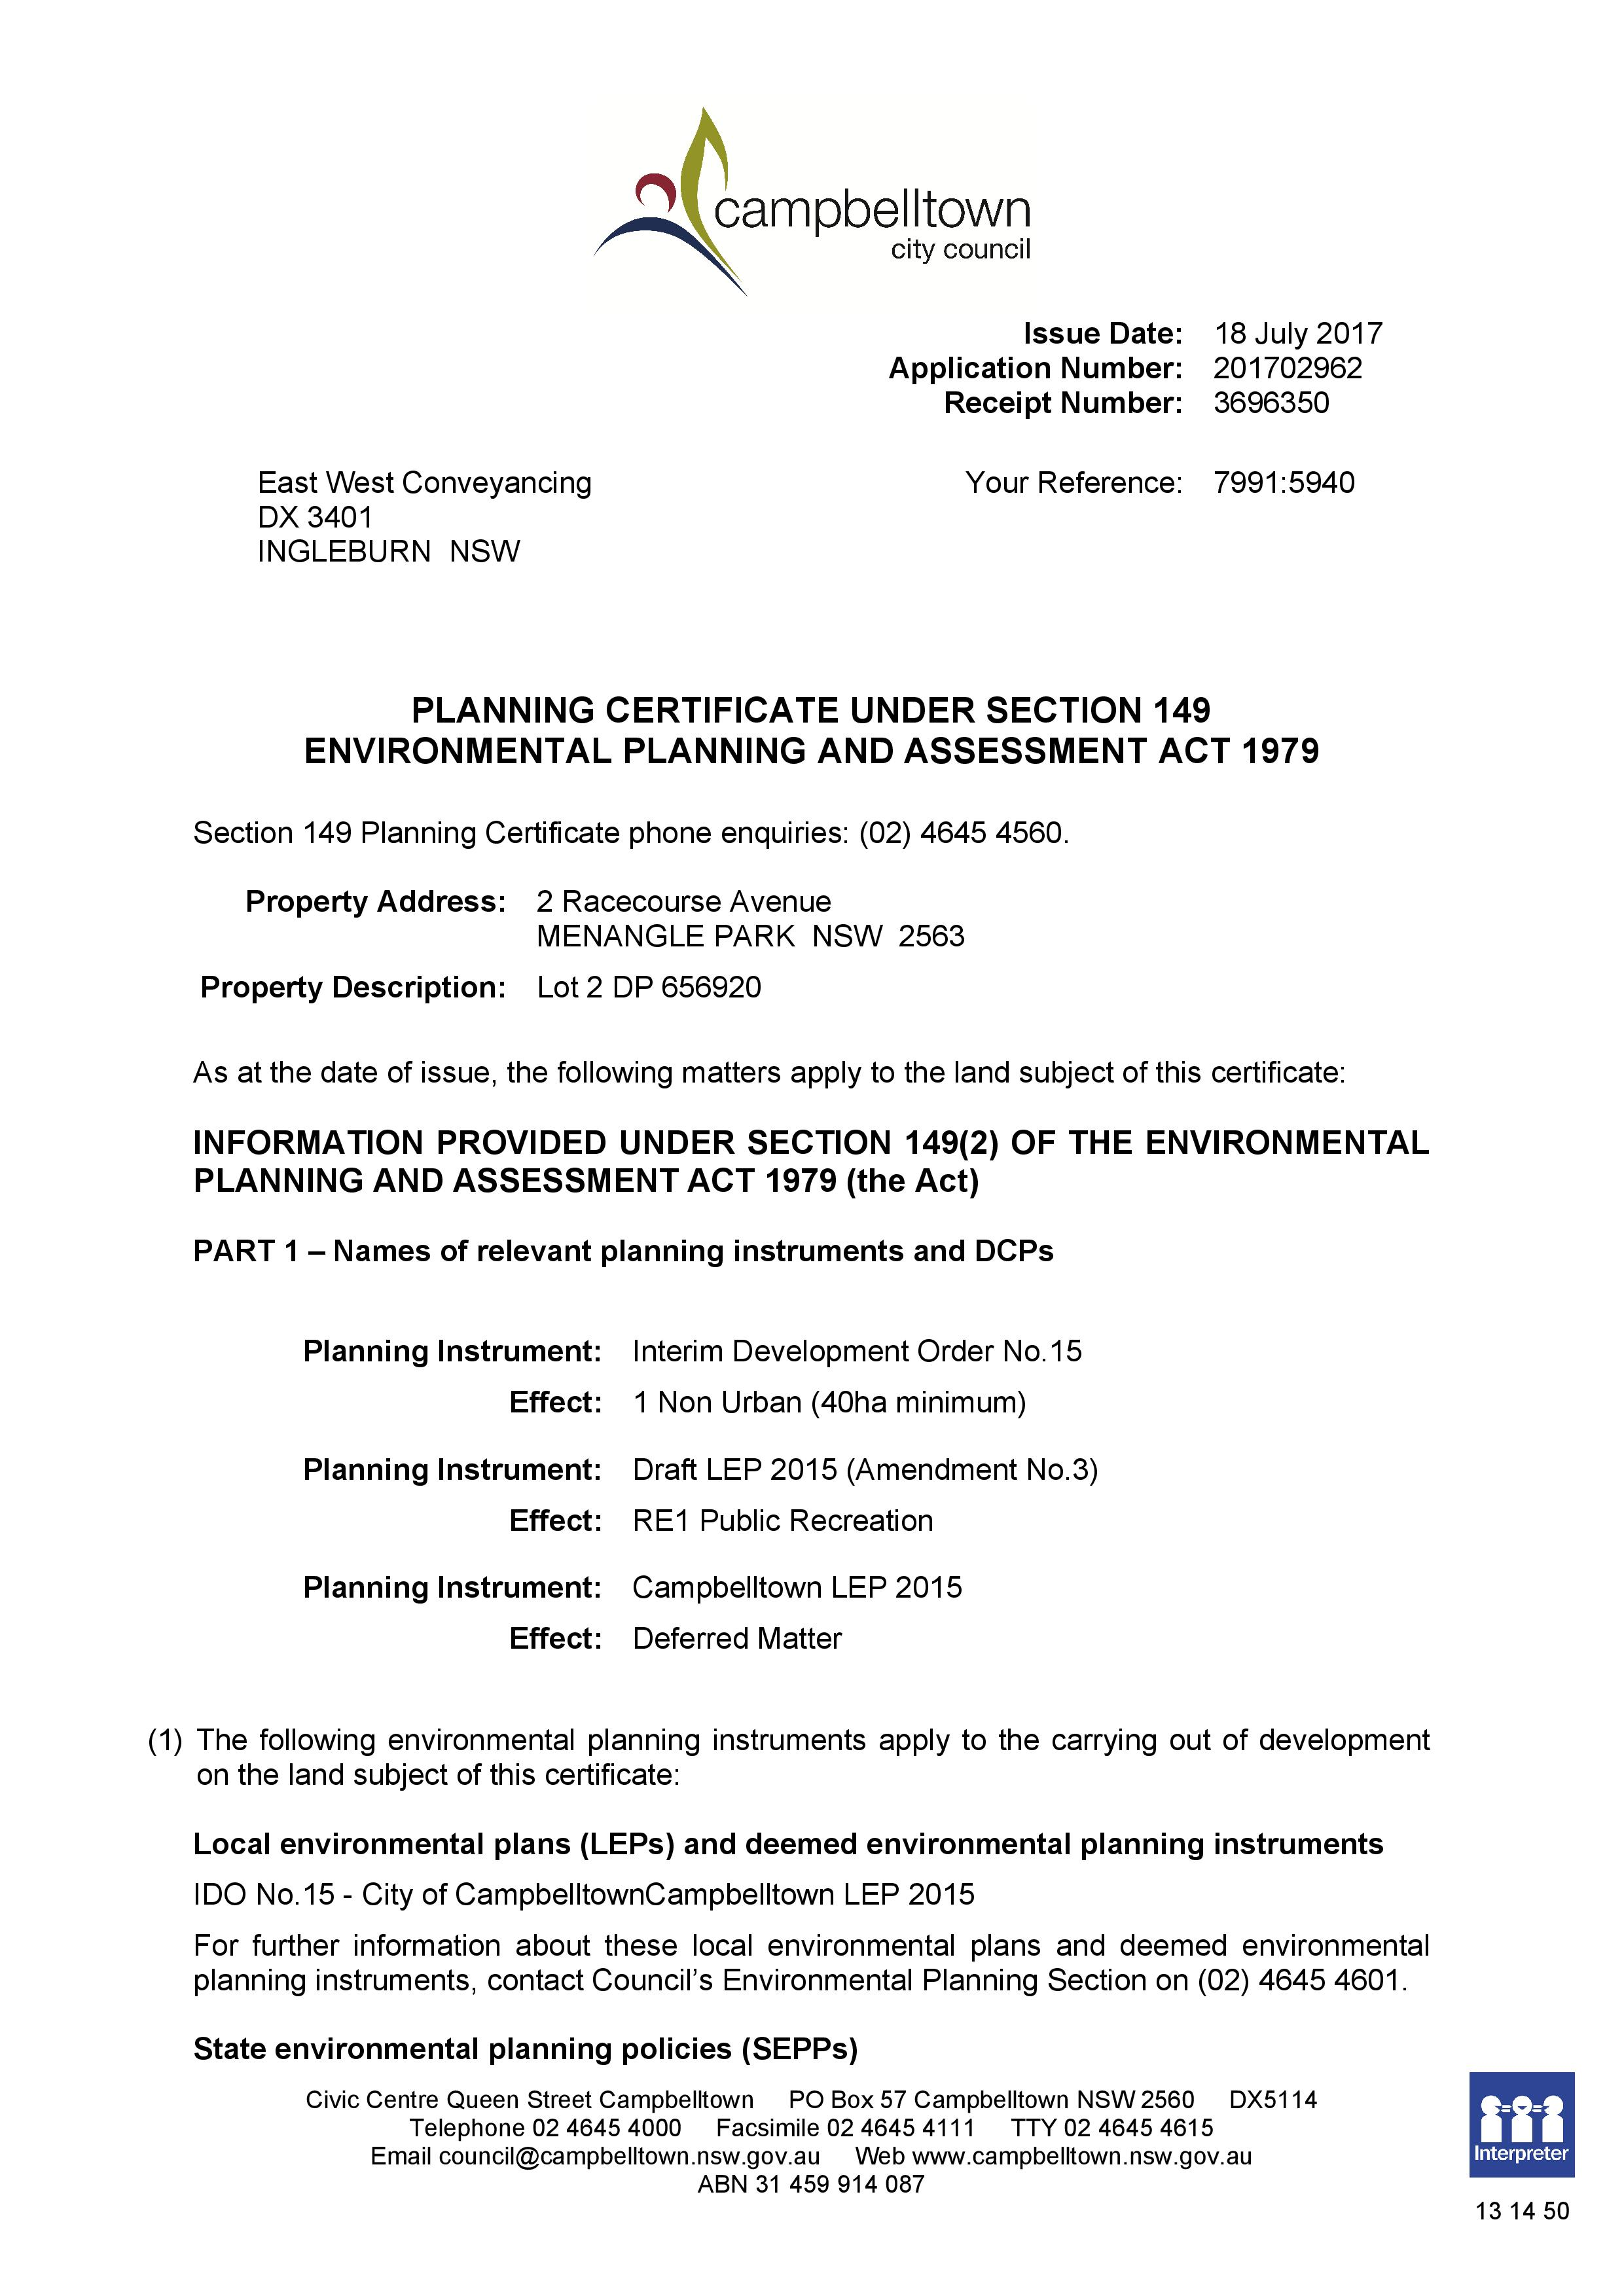 Planning Certificate